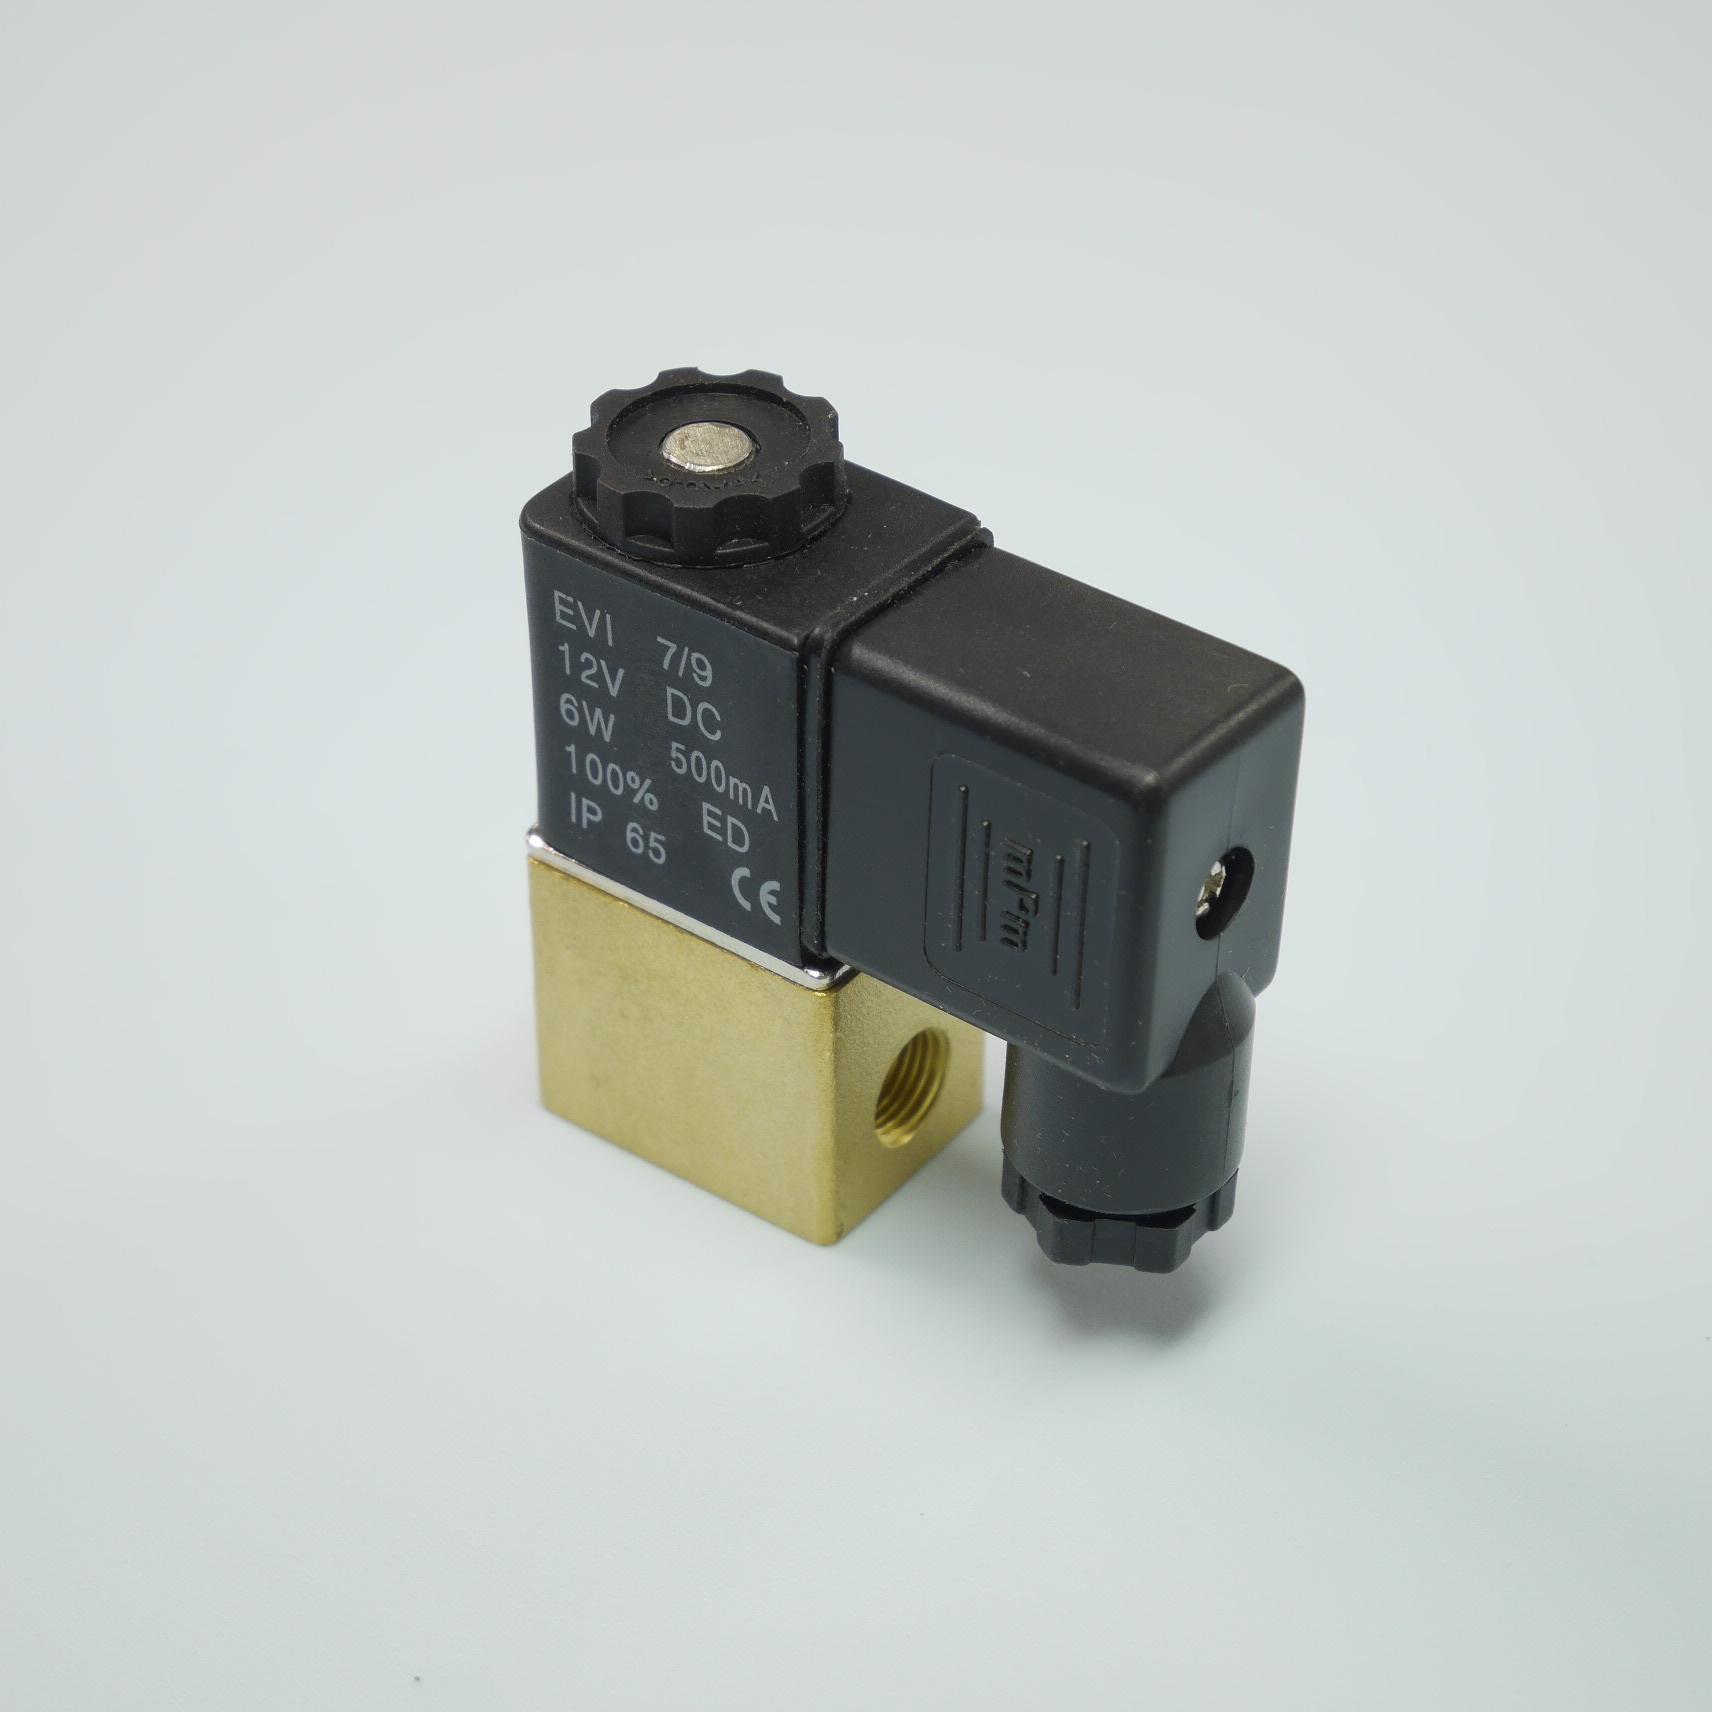 hight resolution of 2 2 way brass solenoid valve 1 8 npt dc12v pu220 01a npt dc12v